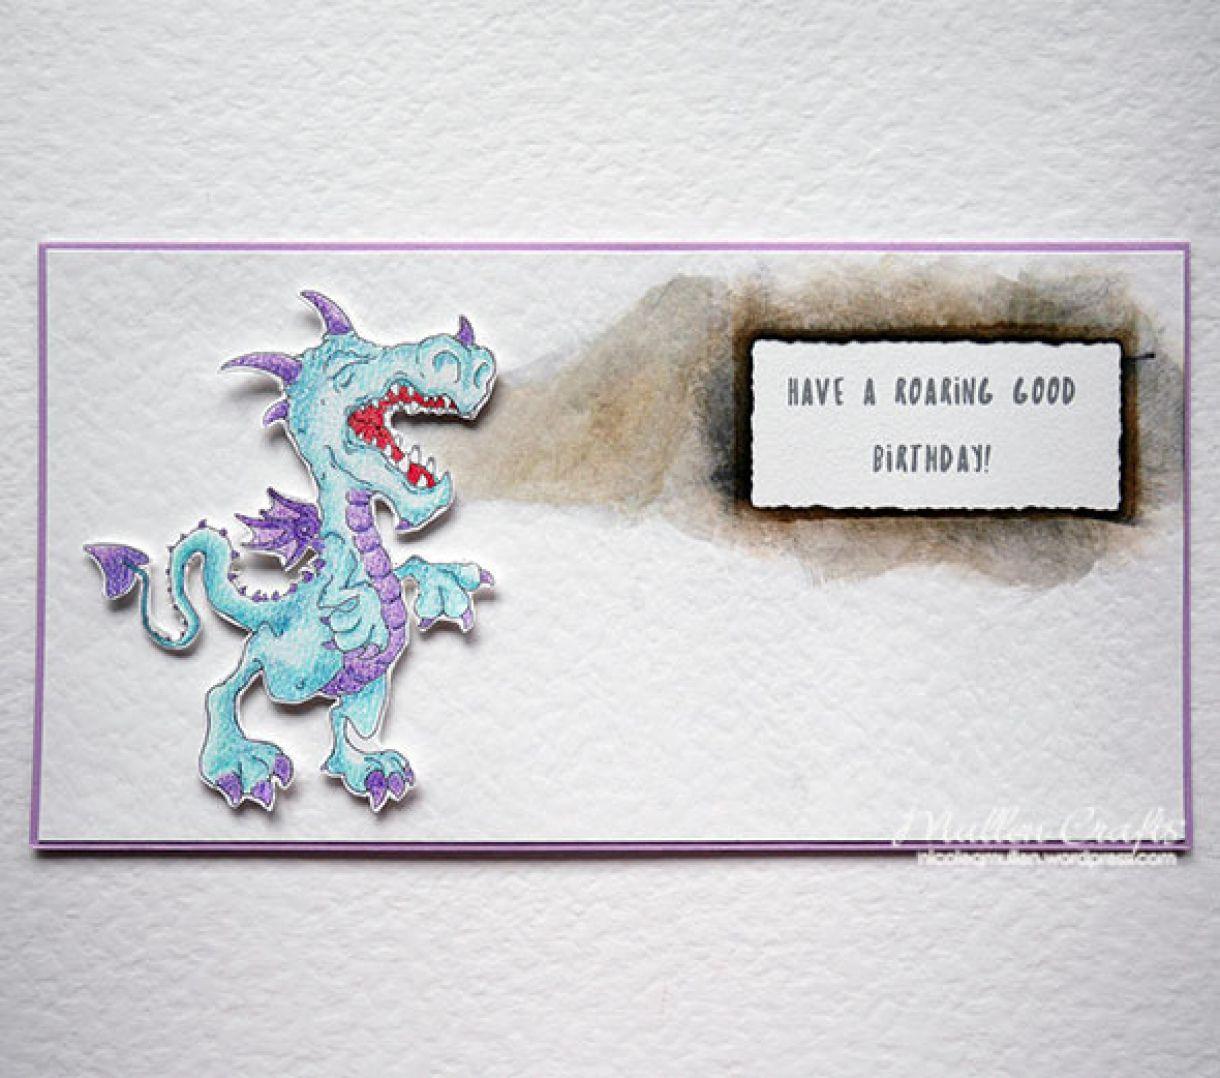 Interesting DIY Birthday Card Idea